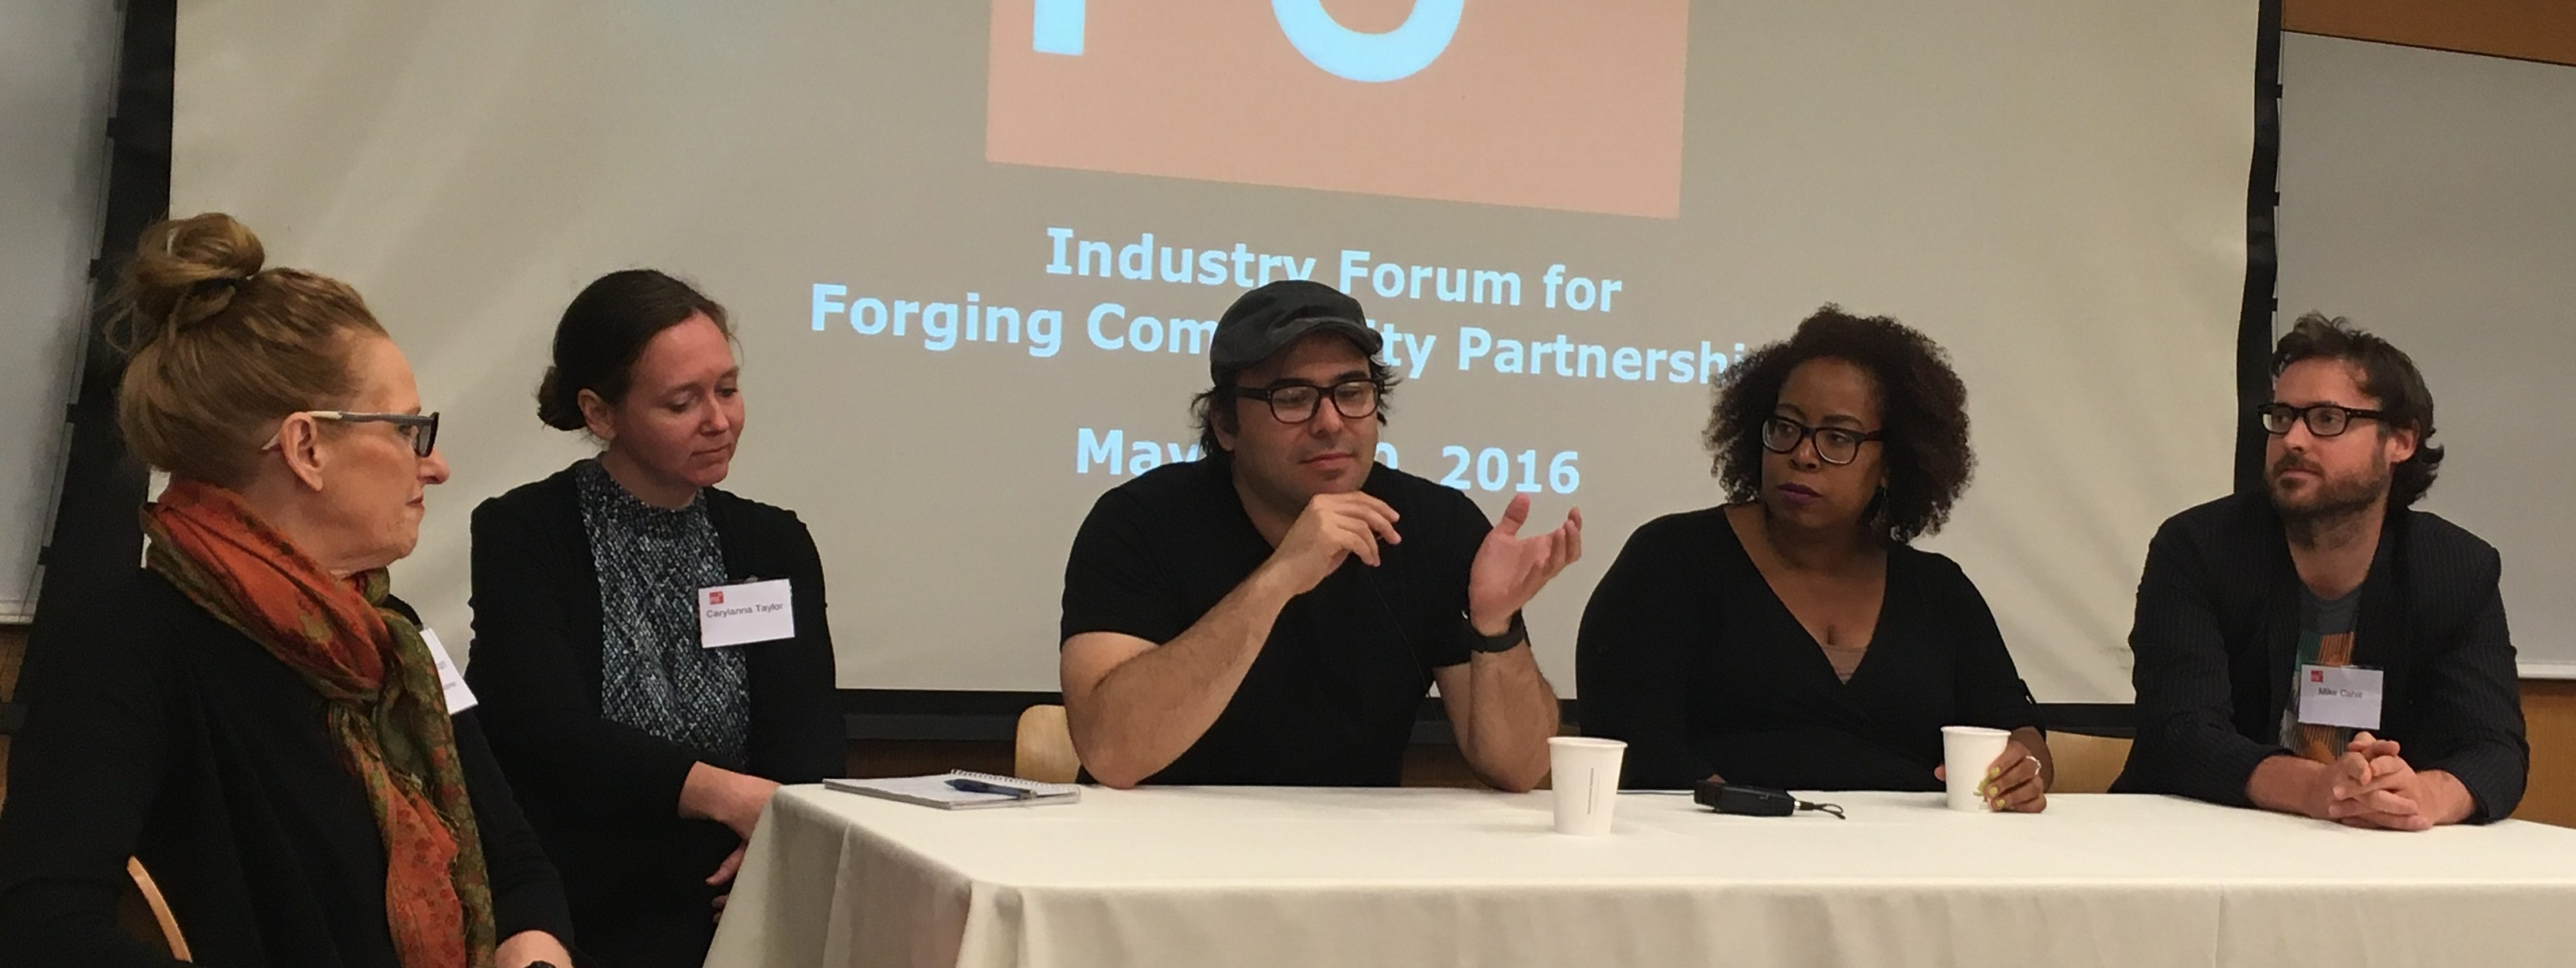 Industry Forum for Forging Community Partnerships